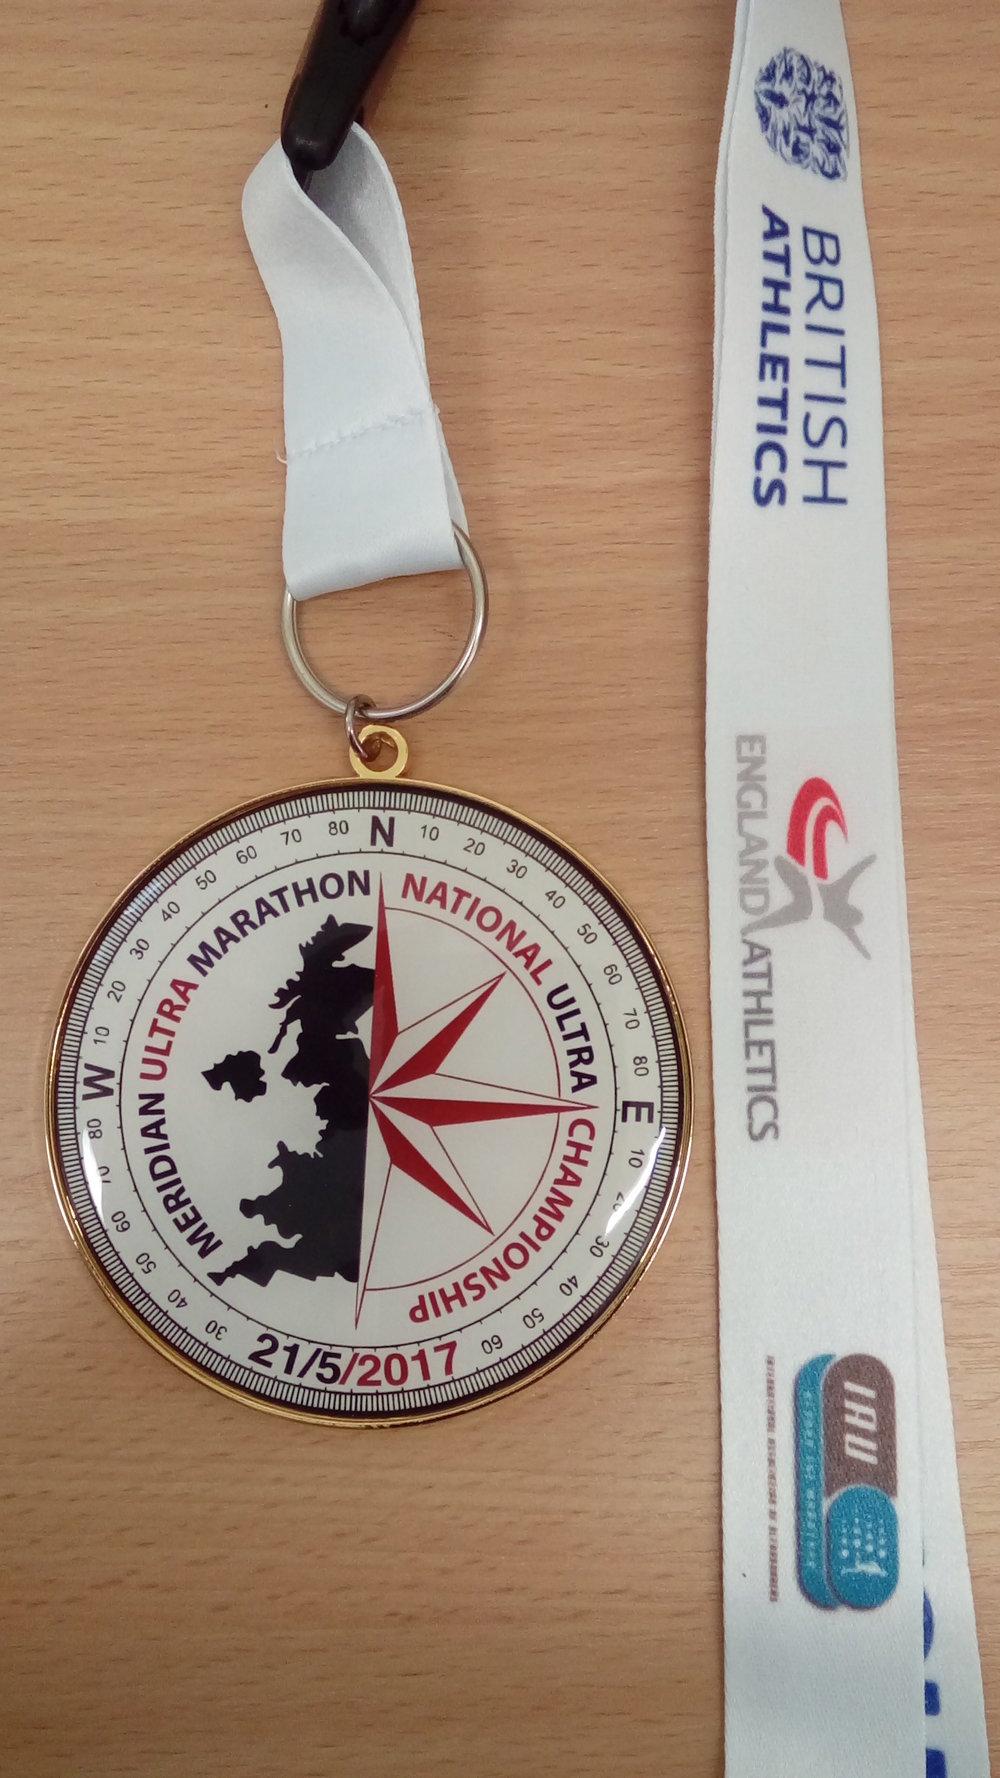 Medal+lanyard small.jpg